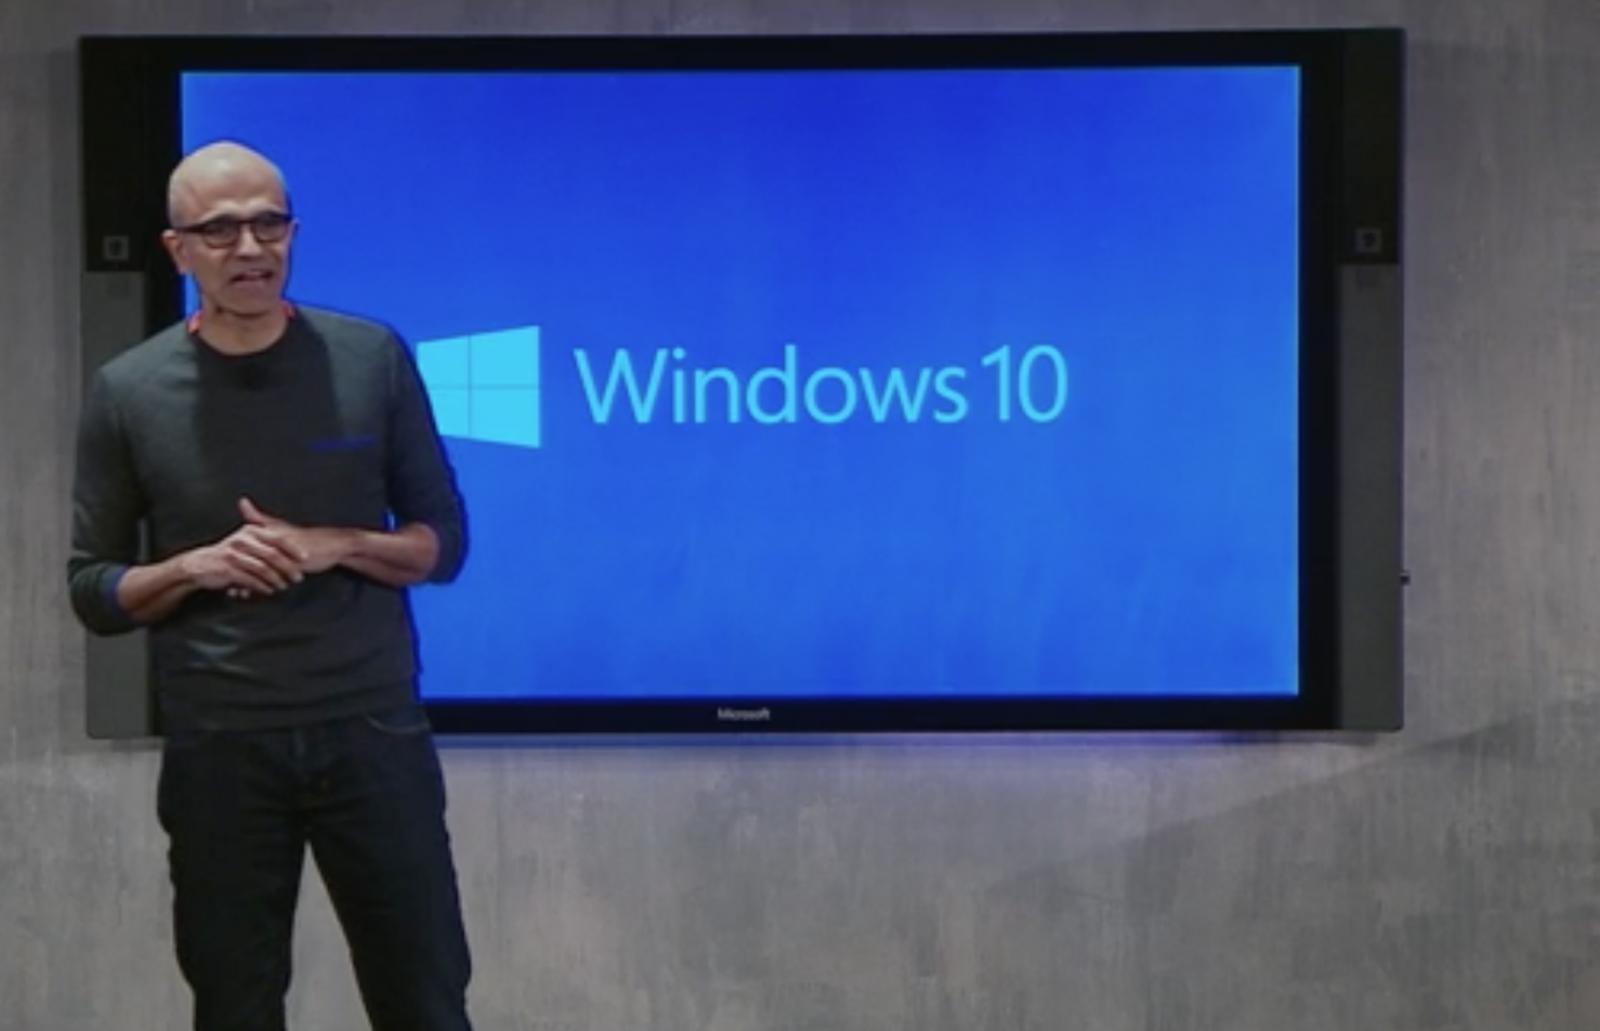 Satya Nadella Windows 10 launch